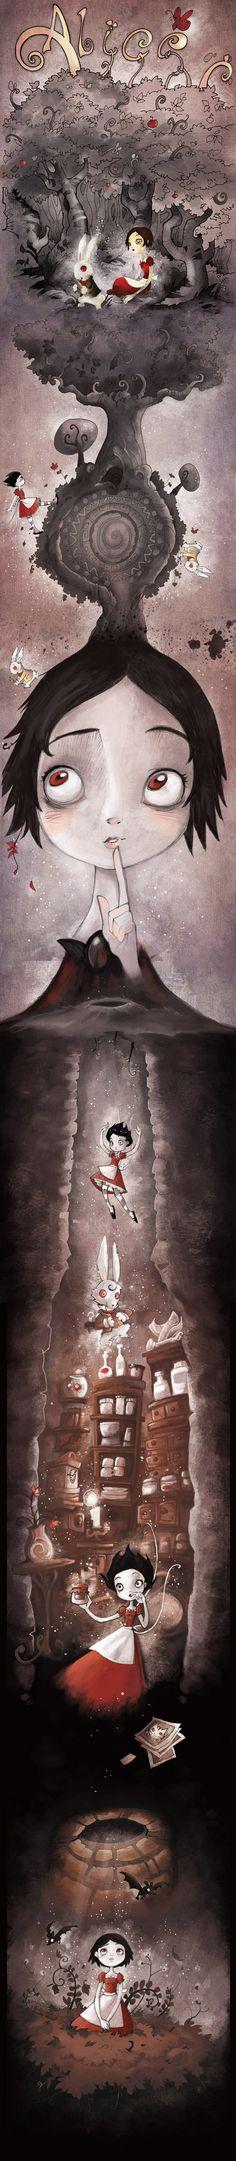 Amazing whimsical art! <3 Alice Underground by The Lab - Down the rabbit hole, wonderland art